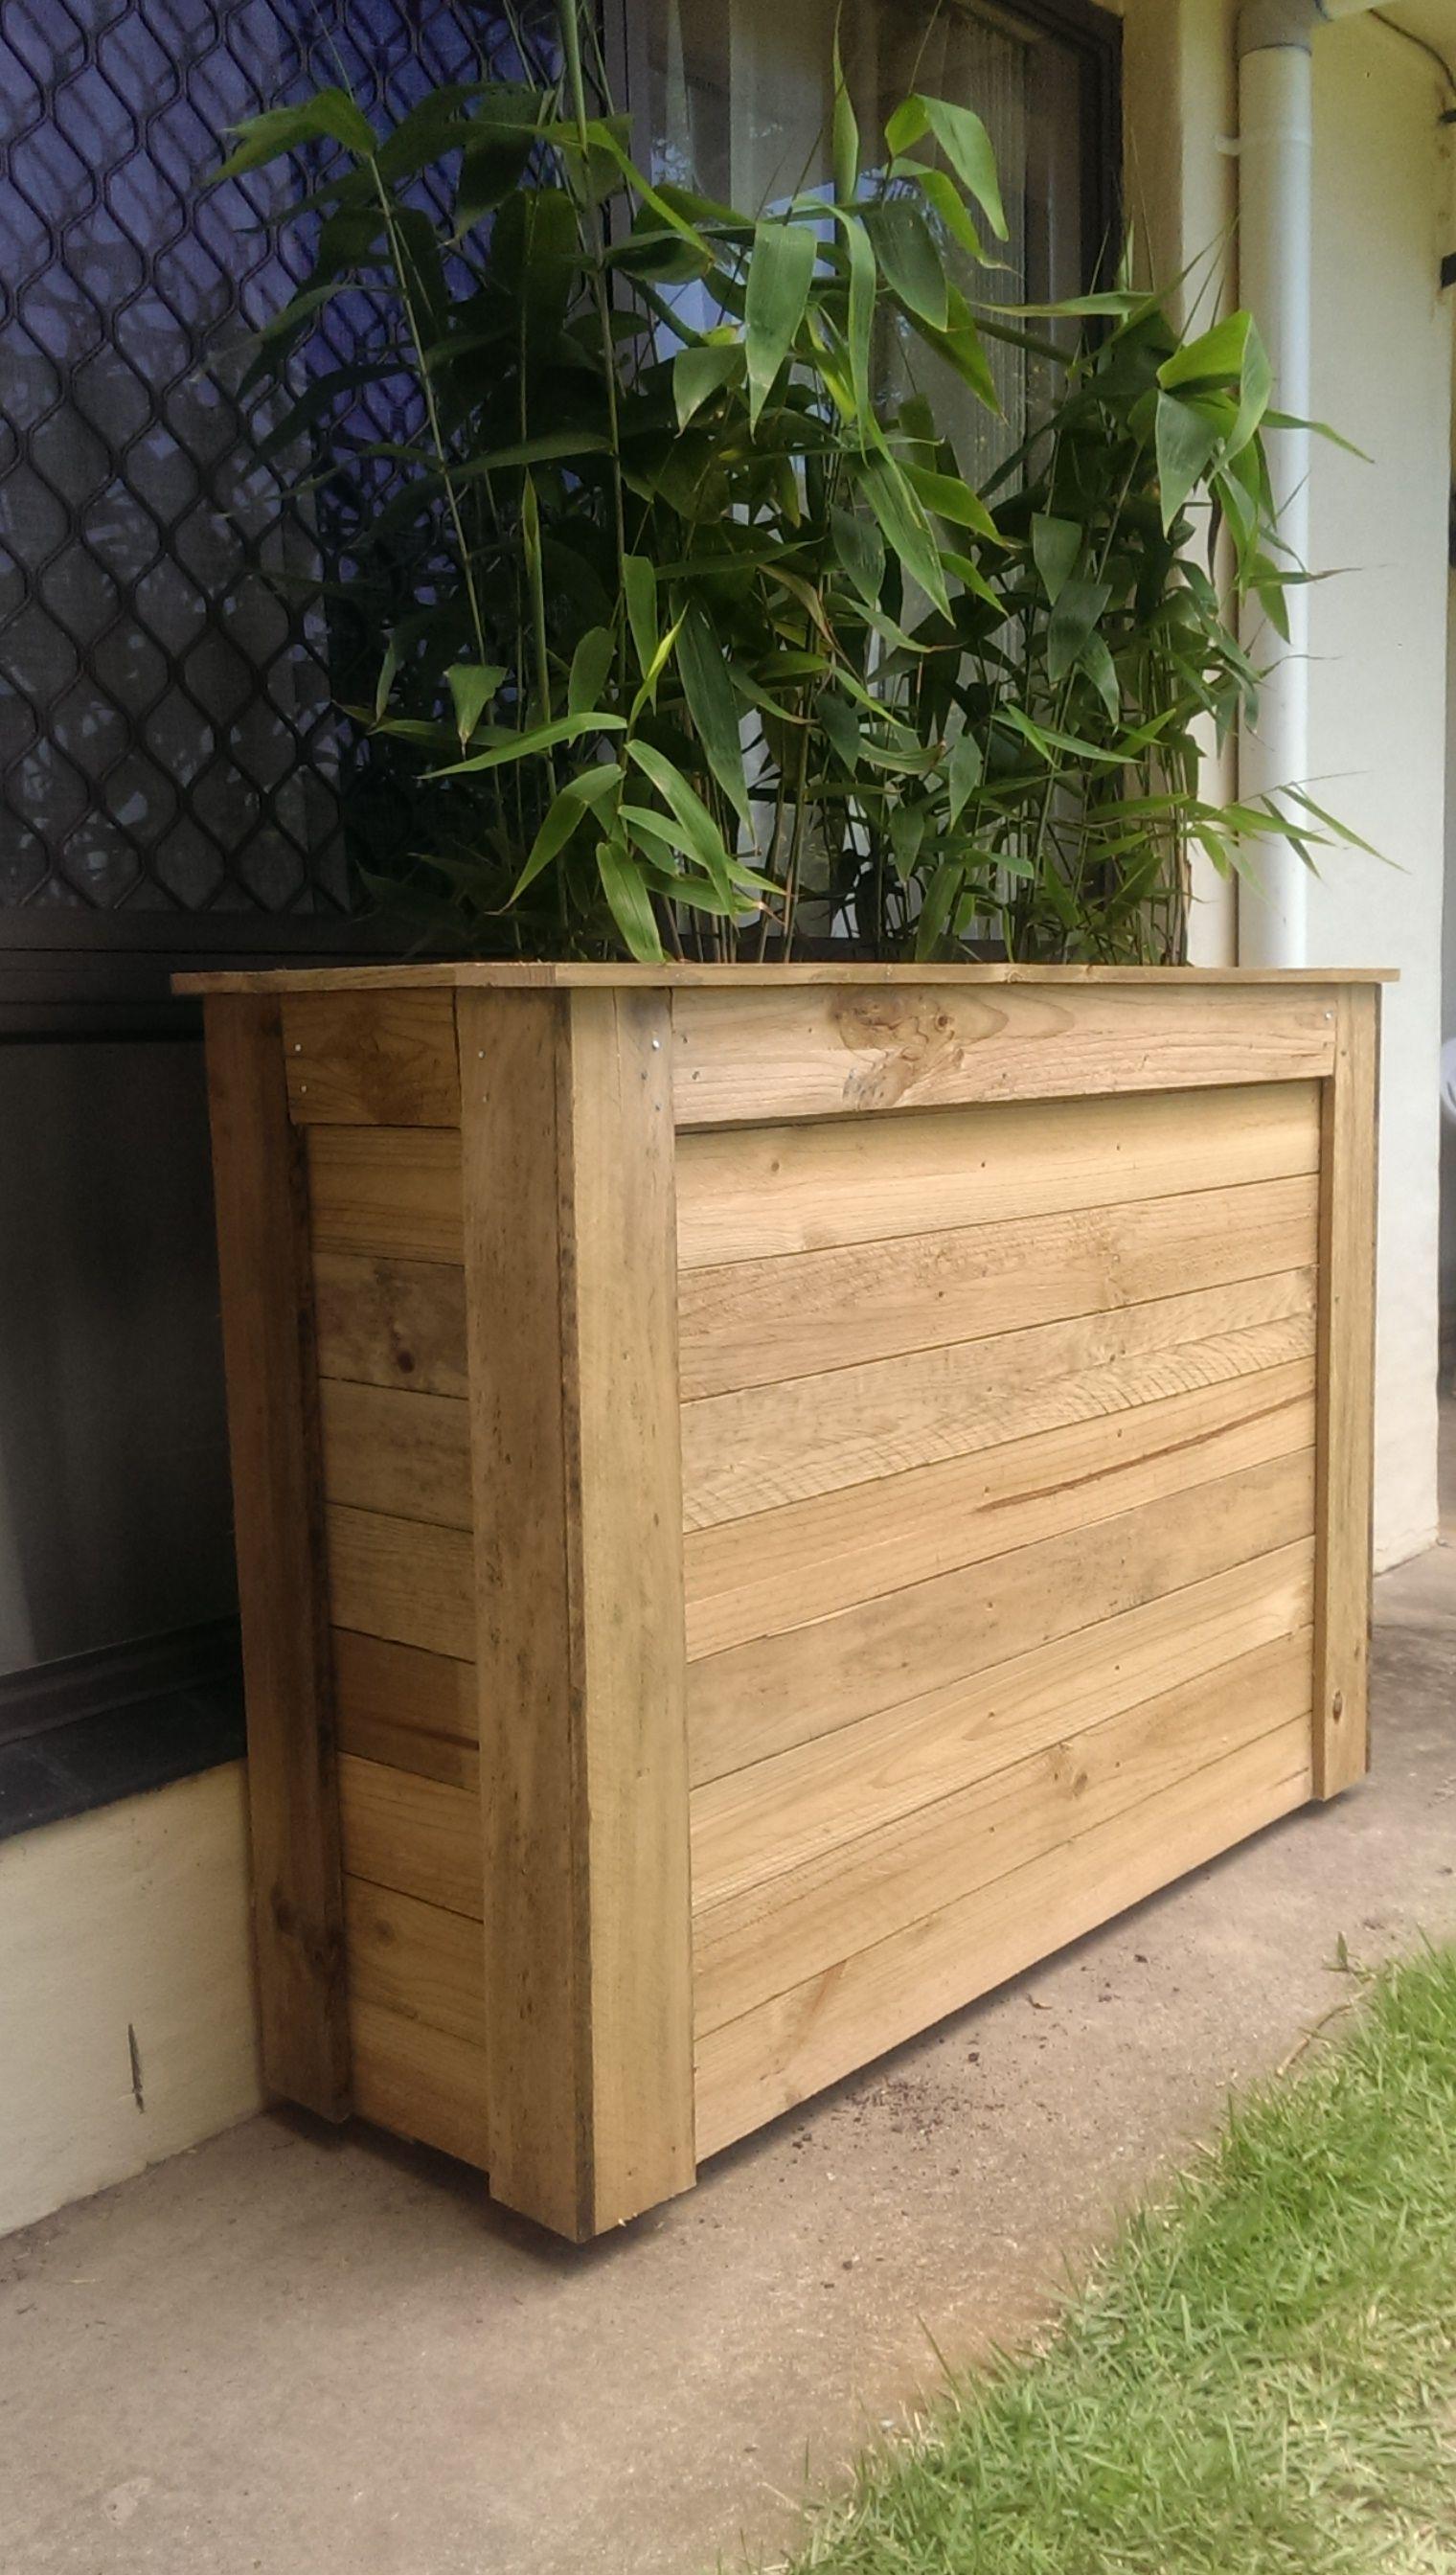 Tall planter box Outdoor planter boxes, Diy planters